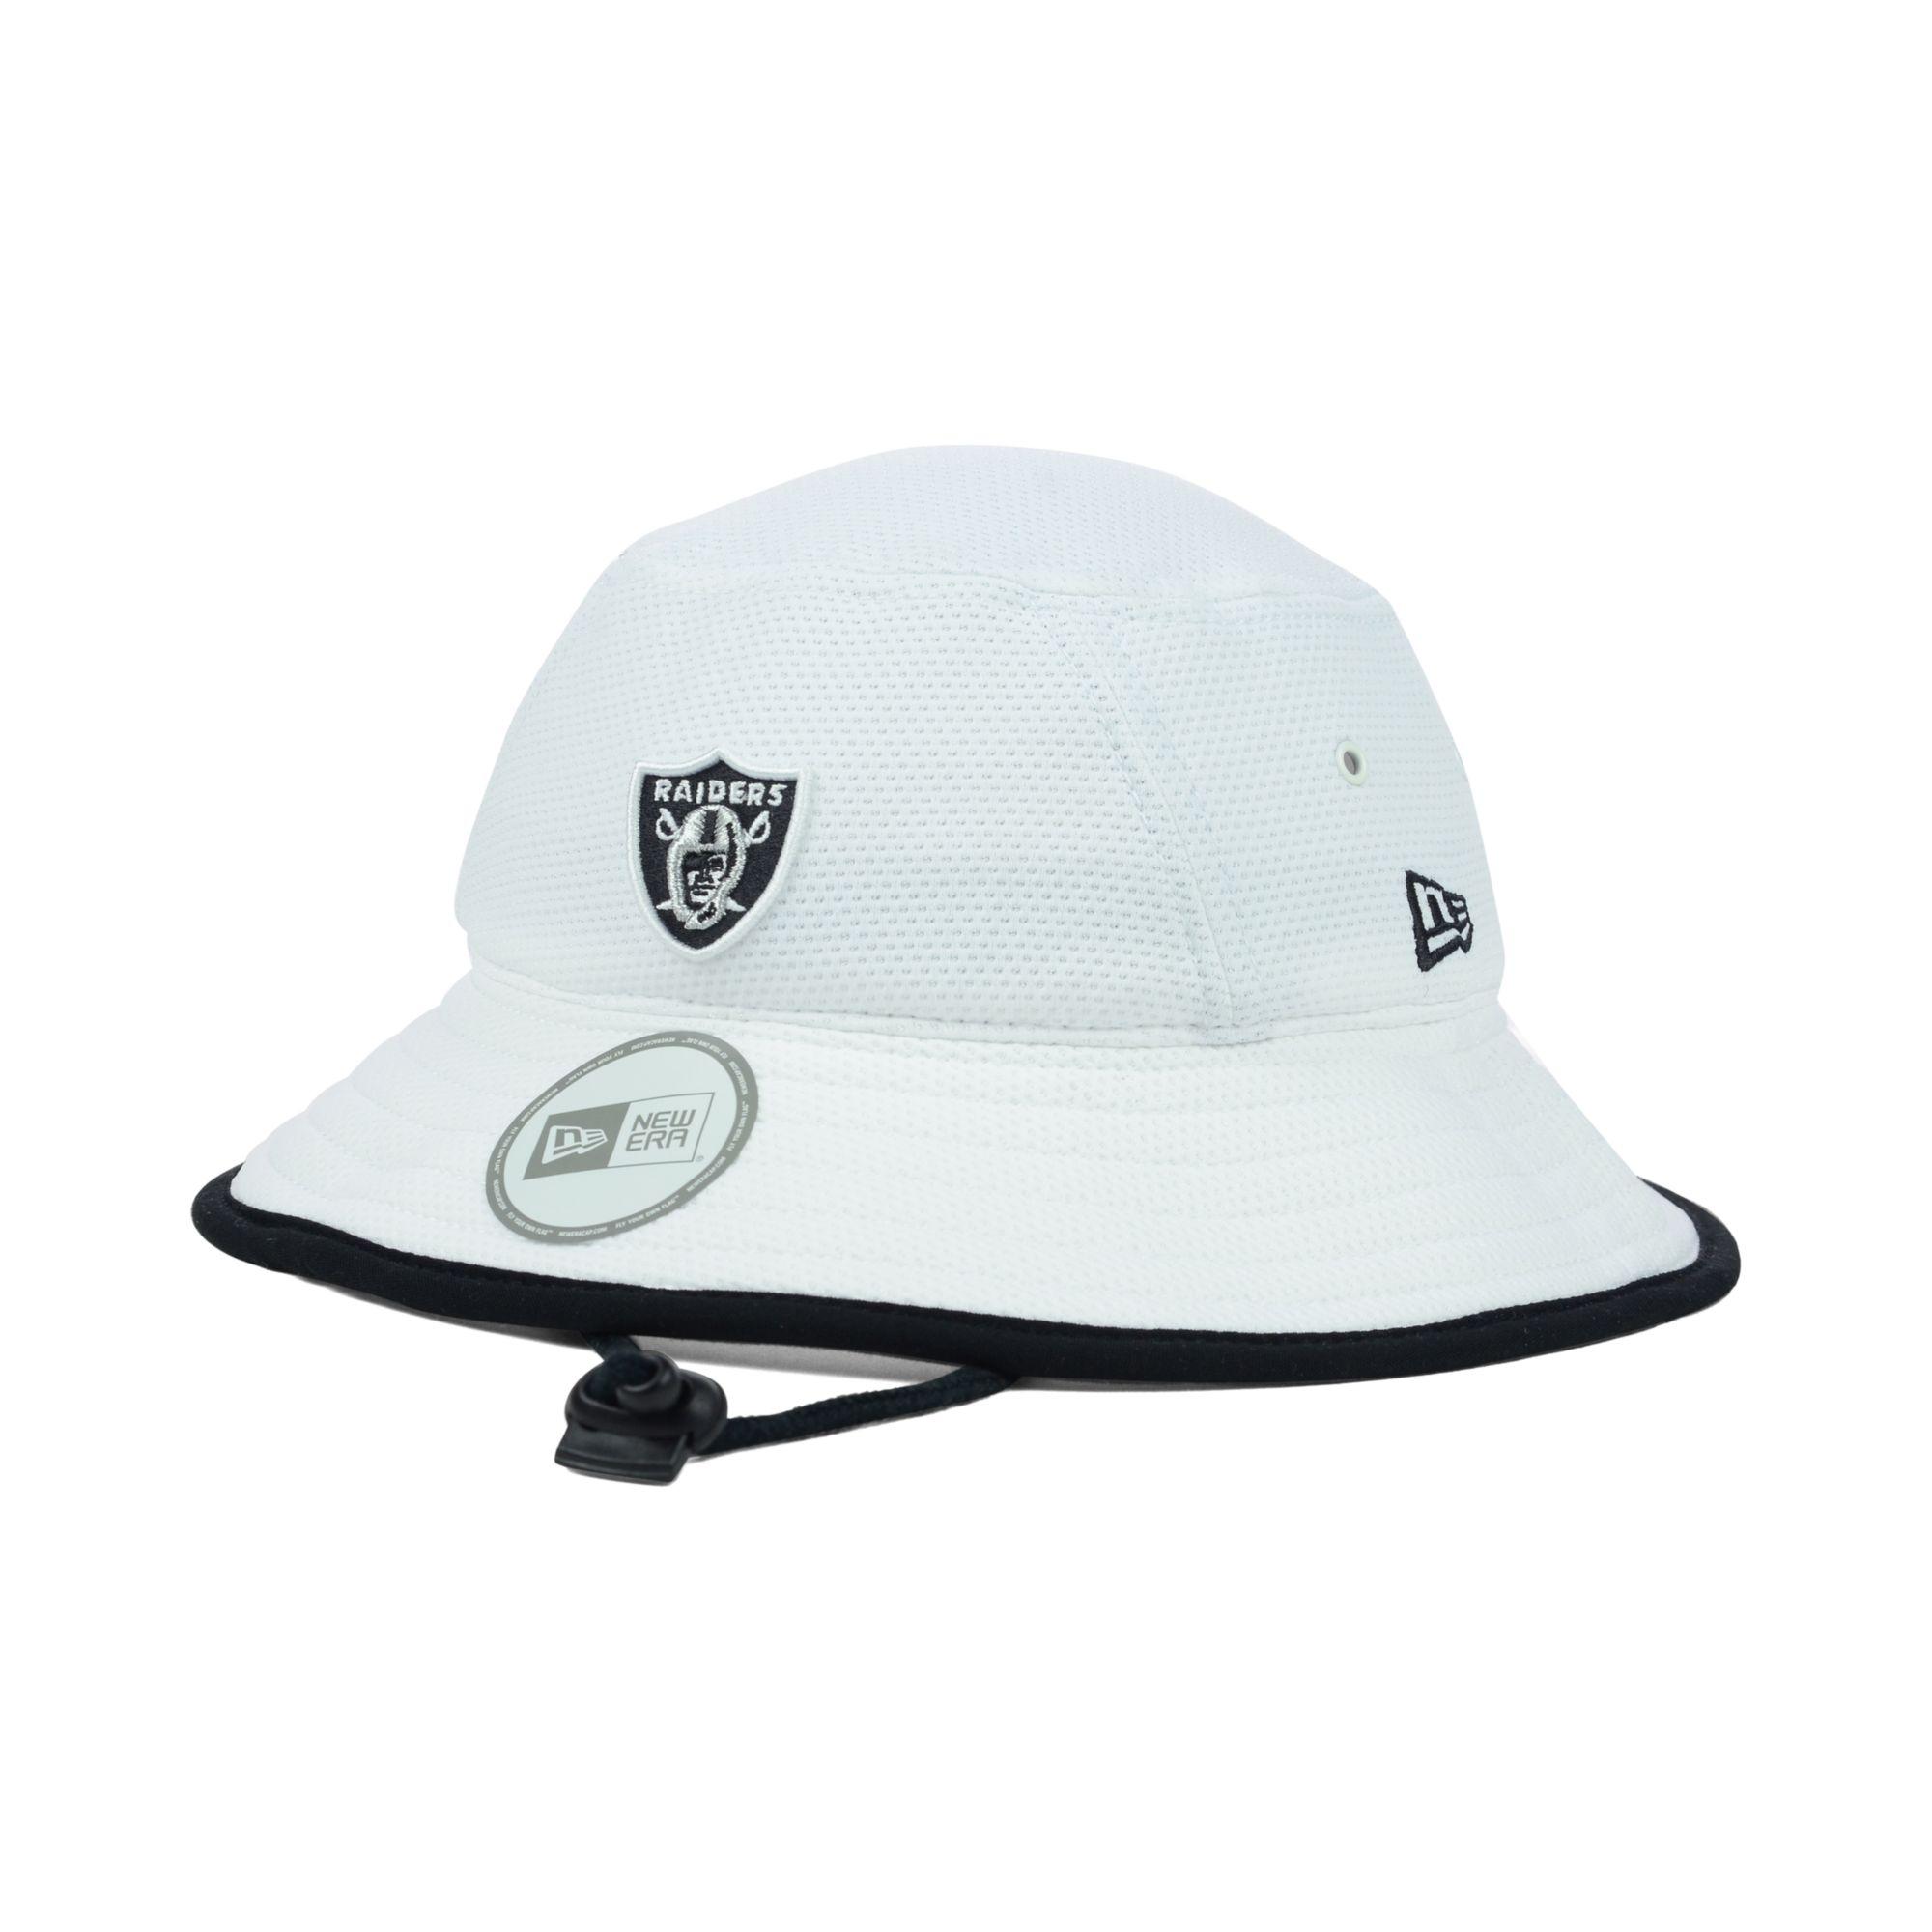 Lyst - KTZ Oakland Raiders Training Camp Bucket Hat in White for Men b31dc1fa353